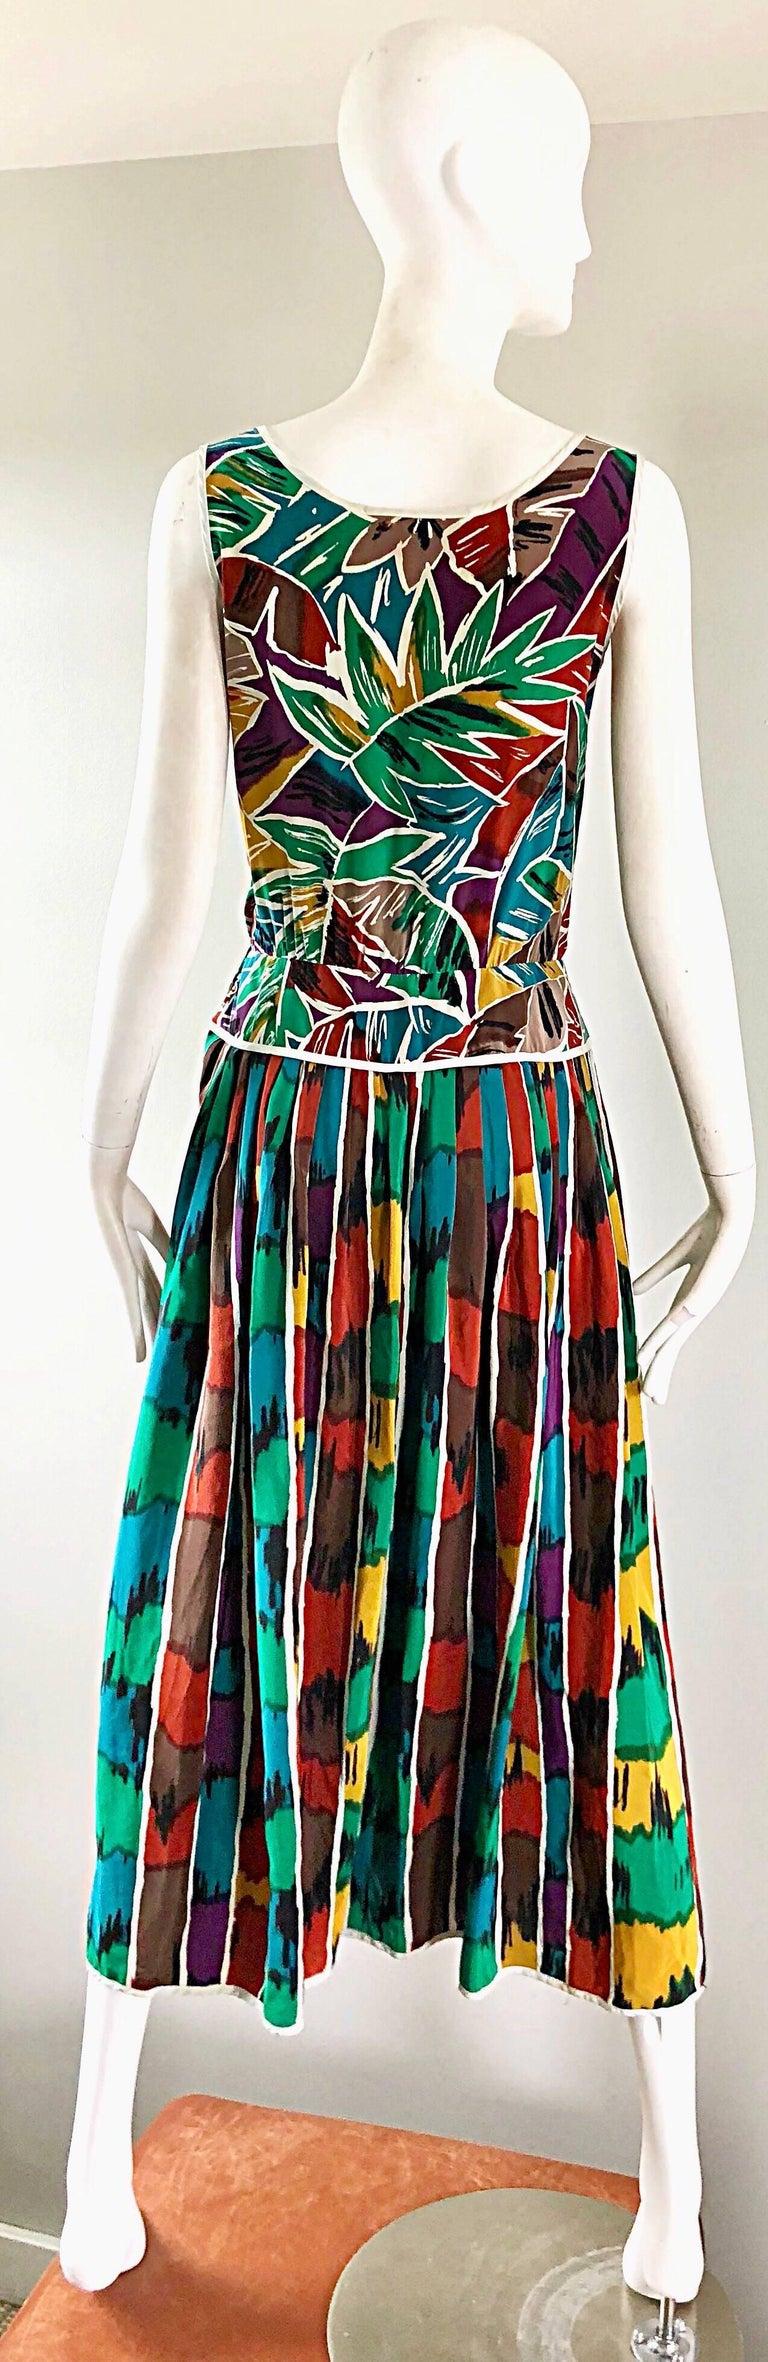 Vintage Oscar de la Renta Size 8 / 10 Kaleidoscope Print Silk Sleeveless Dress In Excellent Condition For Sale In Chicago, IL